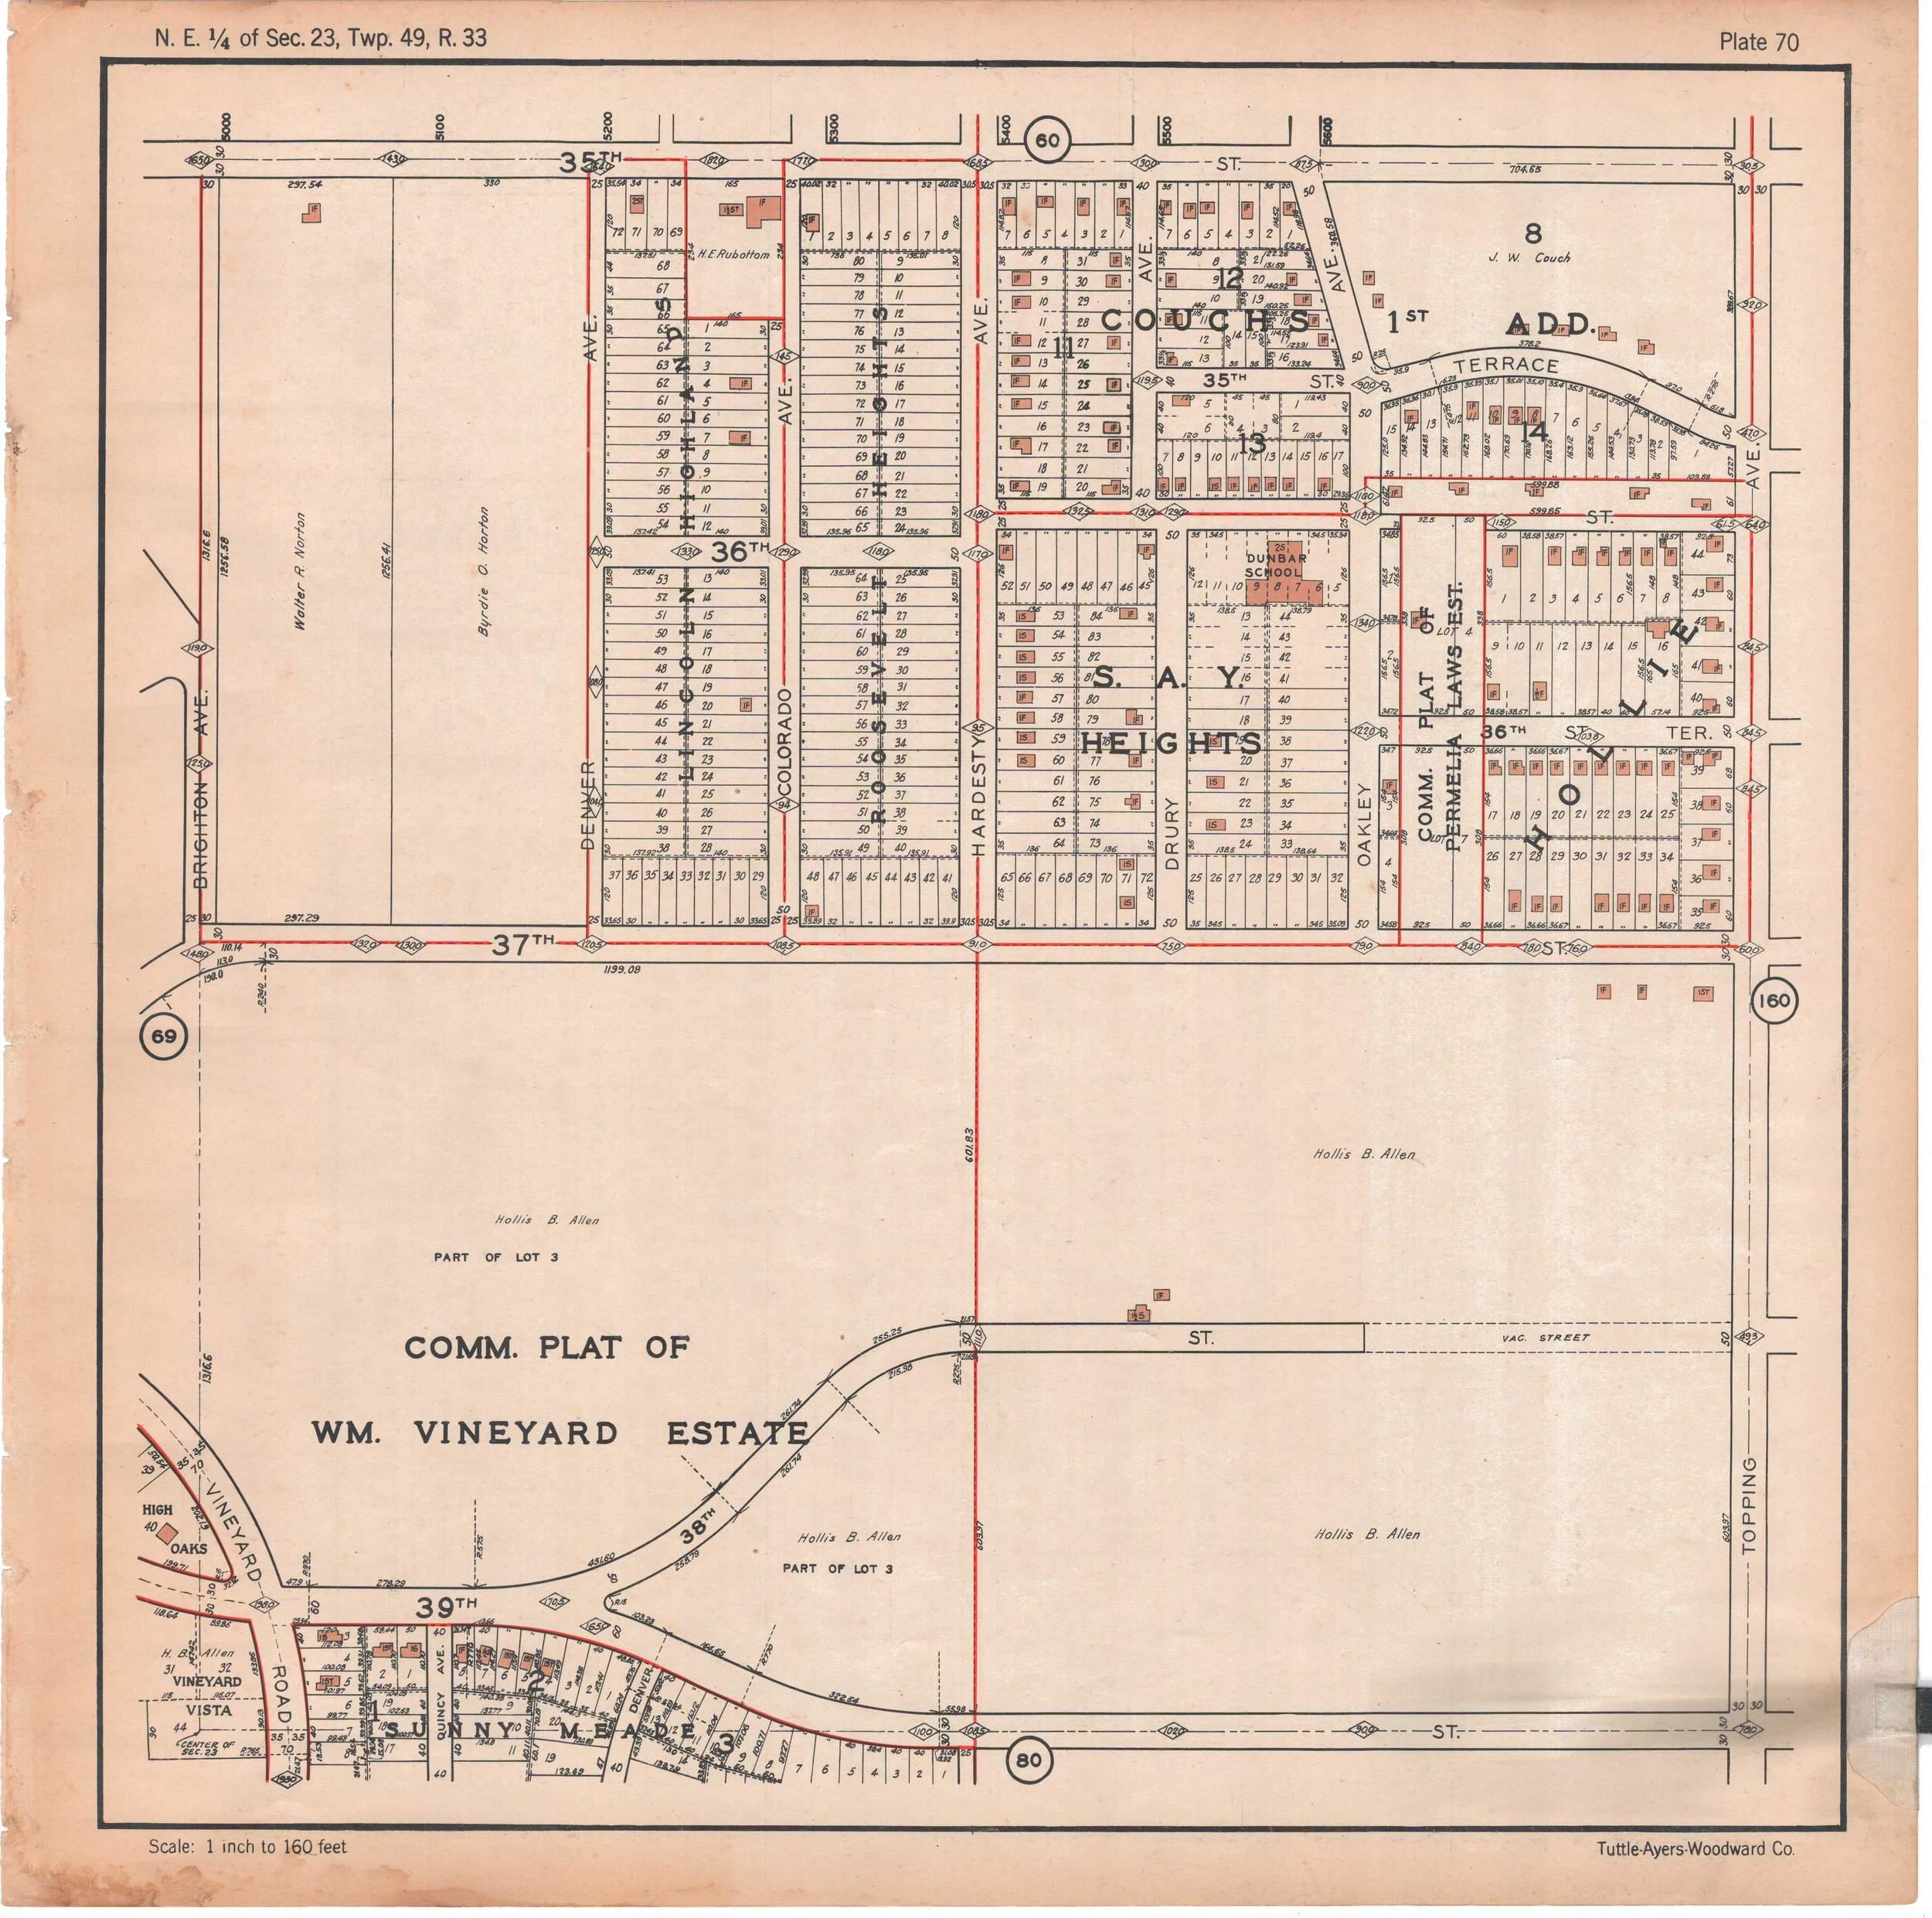 1925 TUTTLE_AYERS_Plate 70.JPG